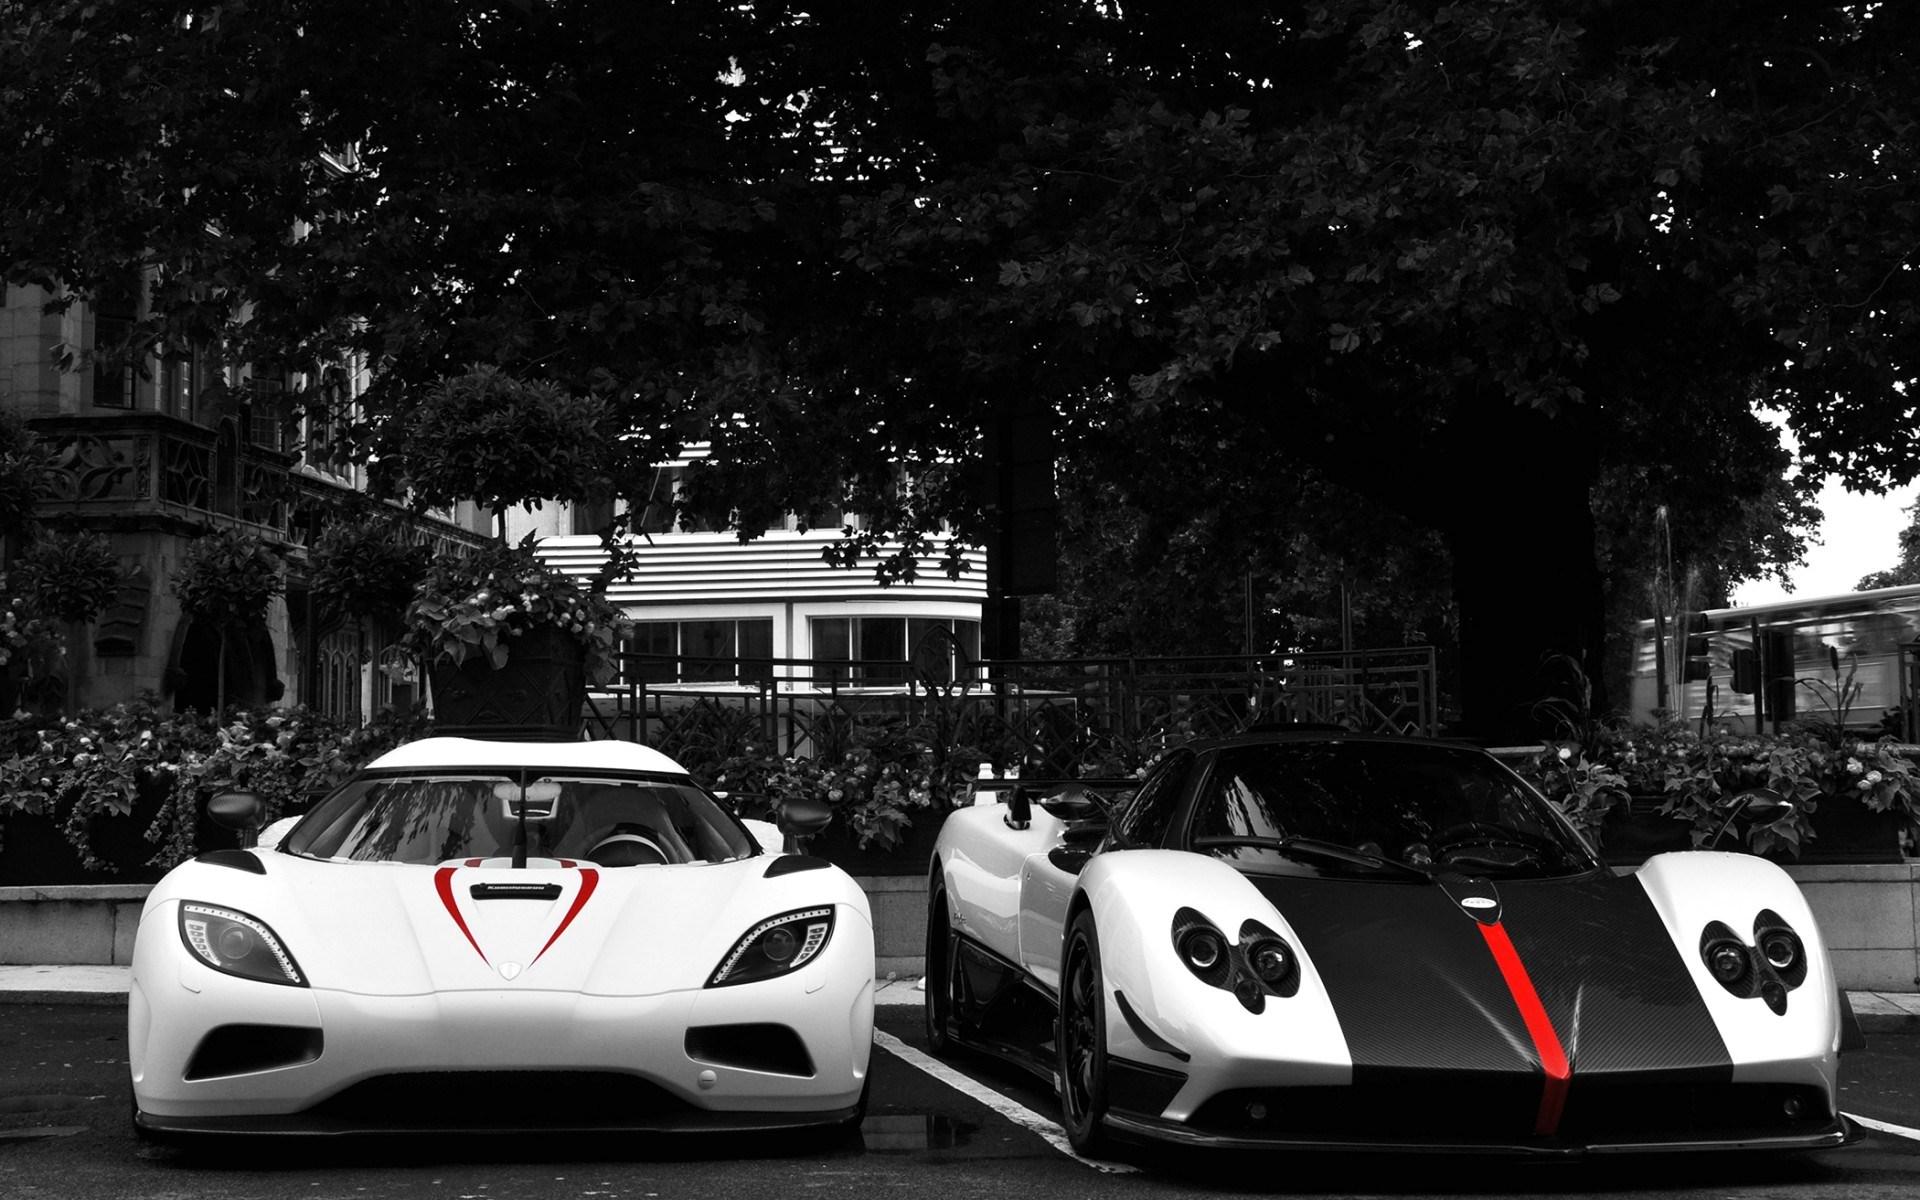 Rs 3d Name Wallpaper Pagani Zonda Koenigsegg Agera R Luxury Exotic Cars